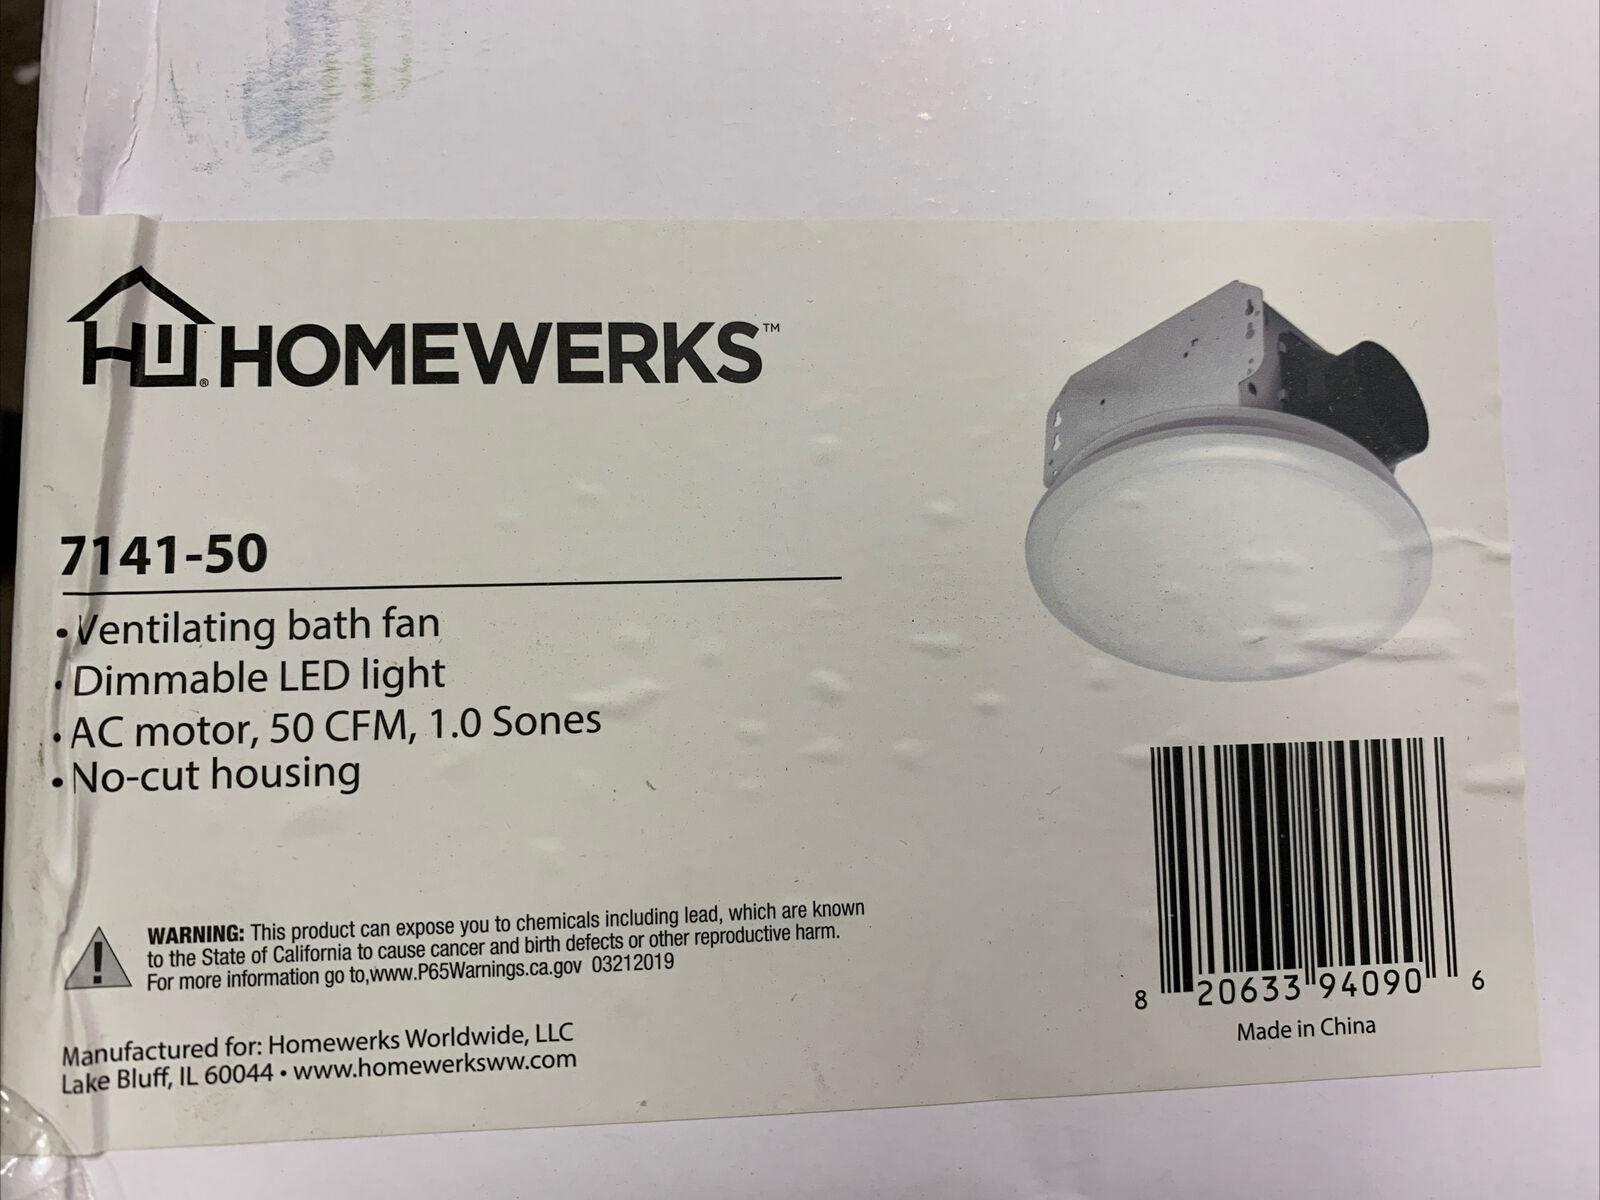 Homewerks Worldwide 50 CFM Ceiling No Cut Installation Bathroom Exhaust Fan with